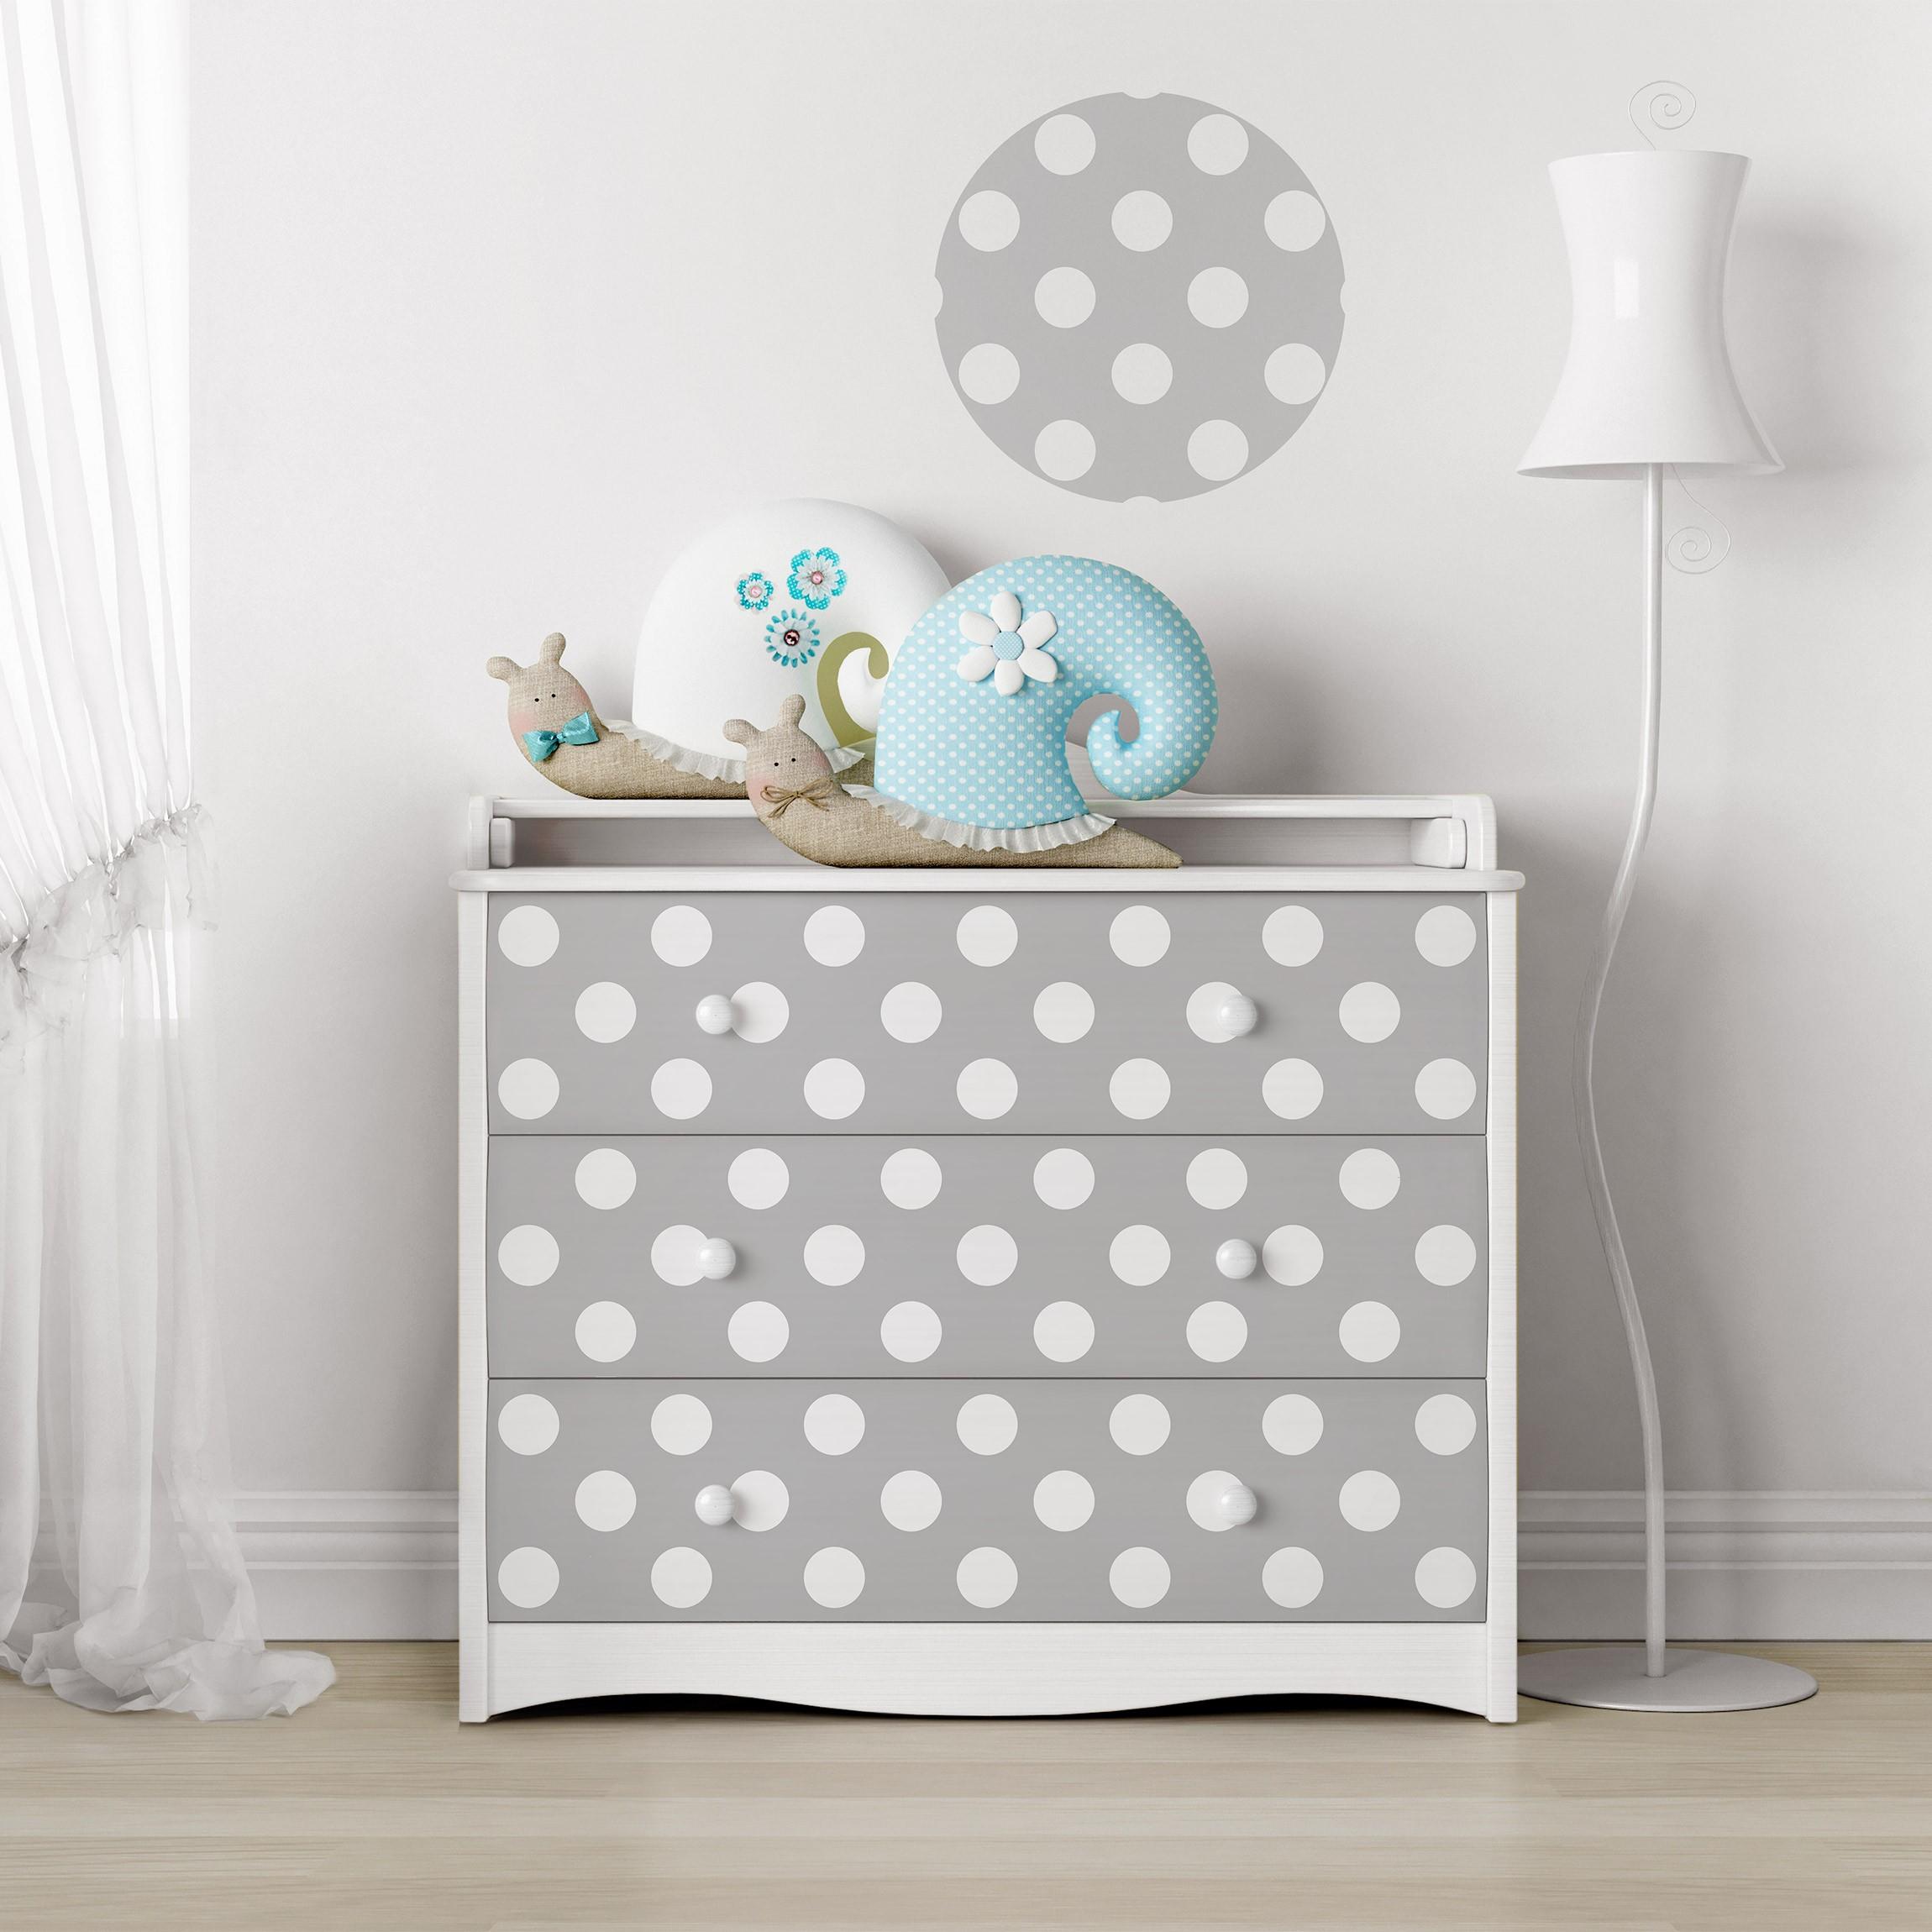 m belfolie punkte in wei auf grau klebefolie f r m bel. Black Bedroom Furniture Sets. Home Design Ideas